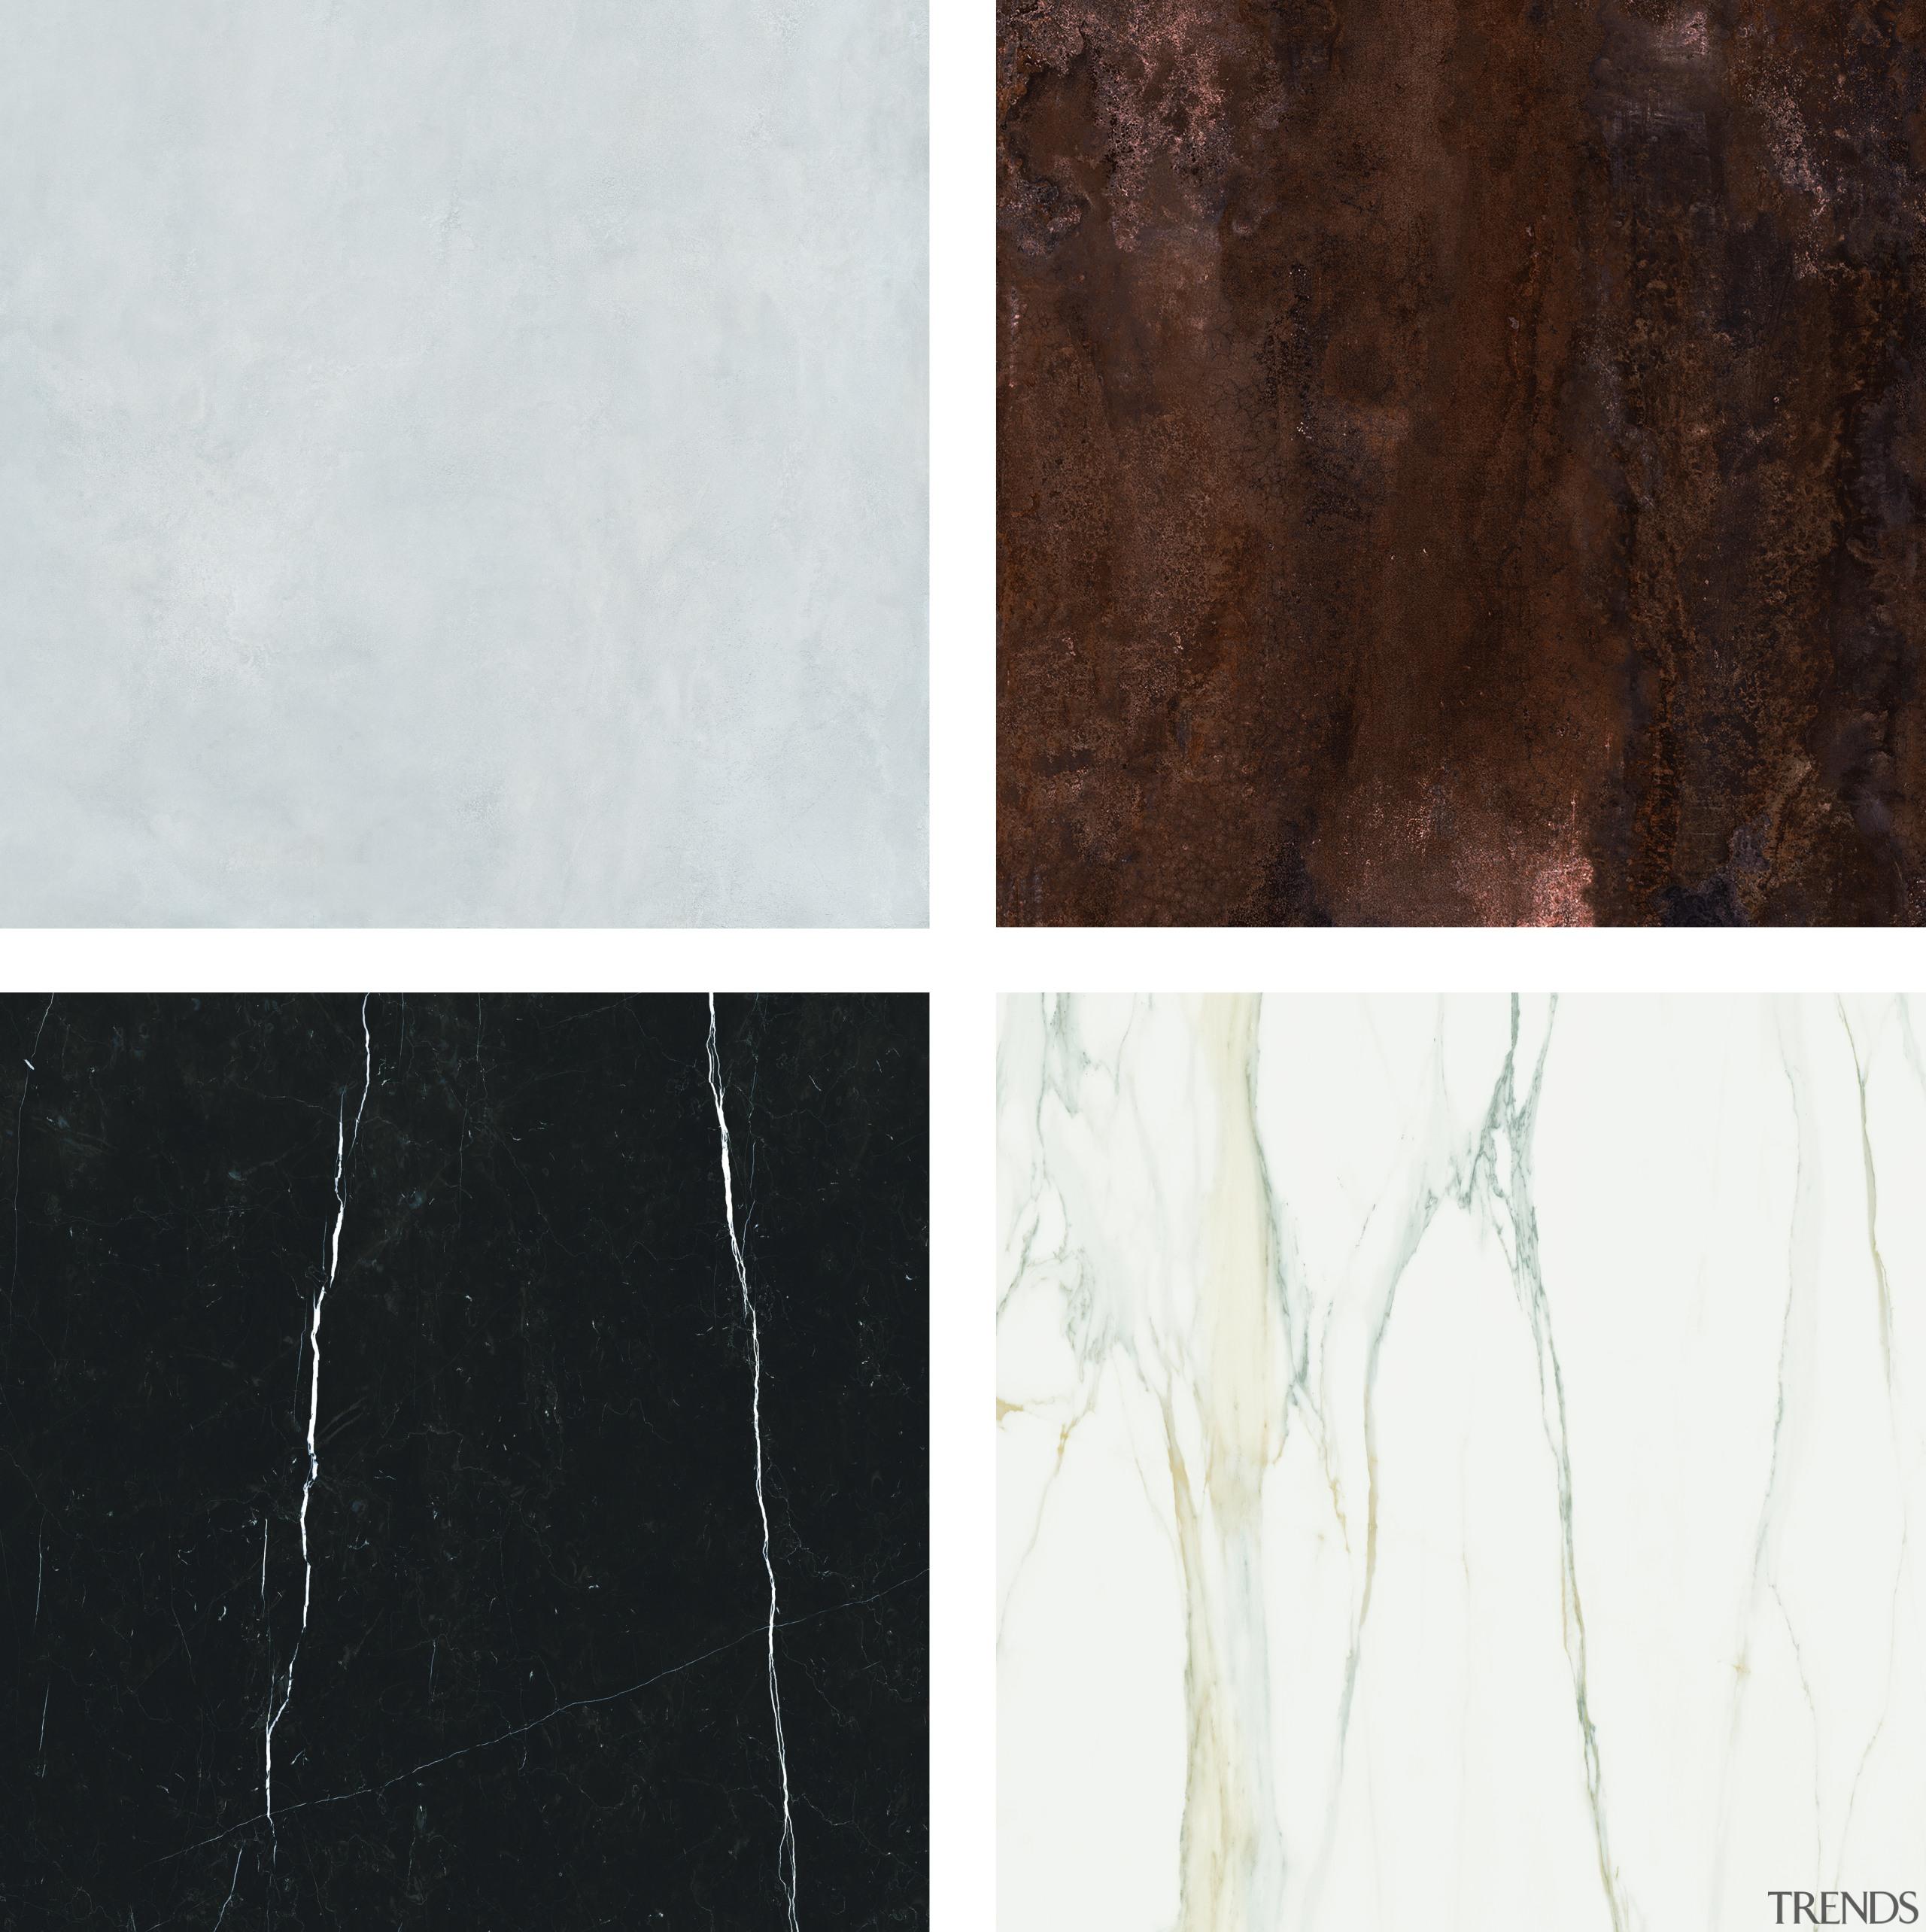 Florim Stone options include (clockwise from top left) Benchtop, Florim Stone, Archant, Countertop